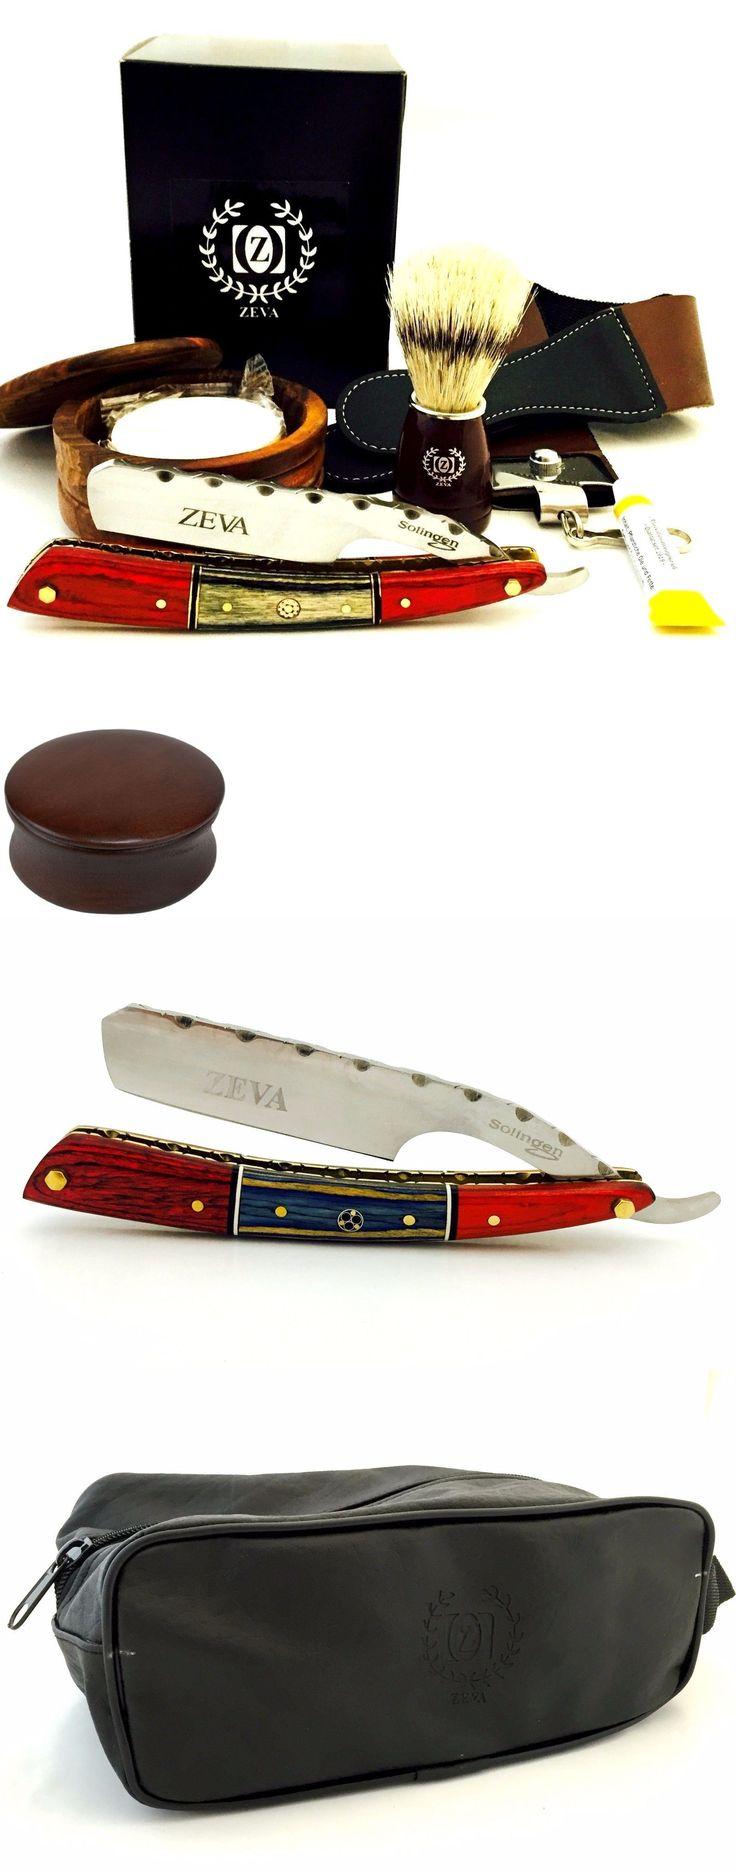 Straight Razors: Zeva Solingen Elegant Wooden Cut Throat Straight Razor Shaving Set, Dovo Paste -> BUY IT NOW ONLY: $99.99 on eBay!